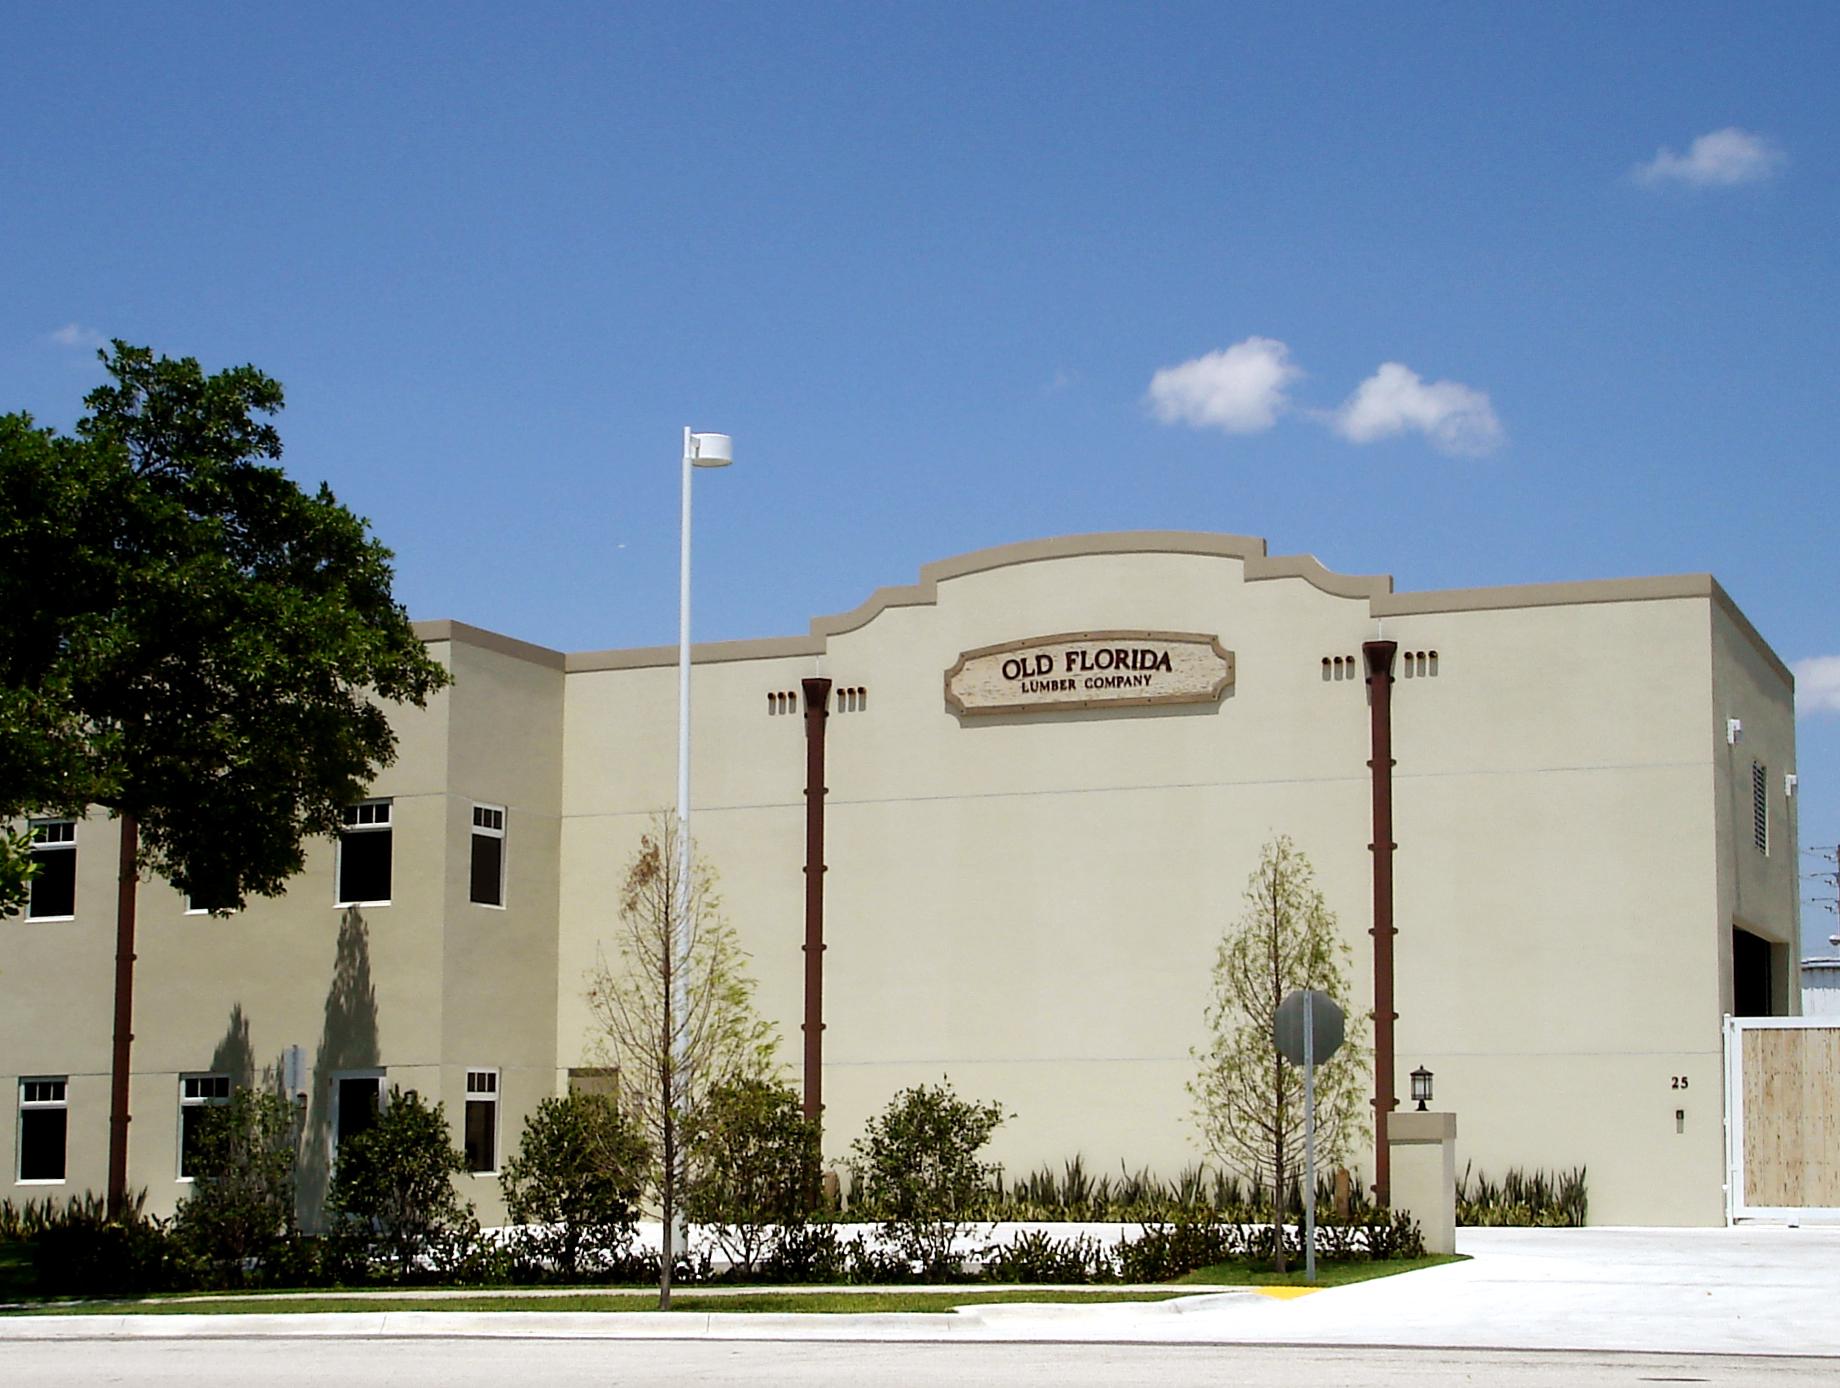 Old Florida Lumber Company.jpg